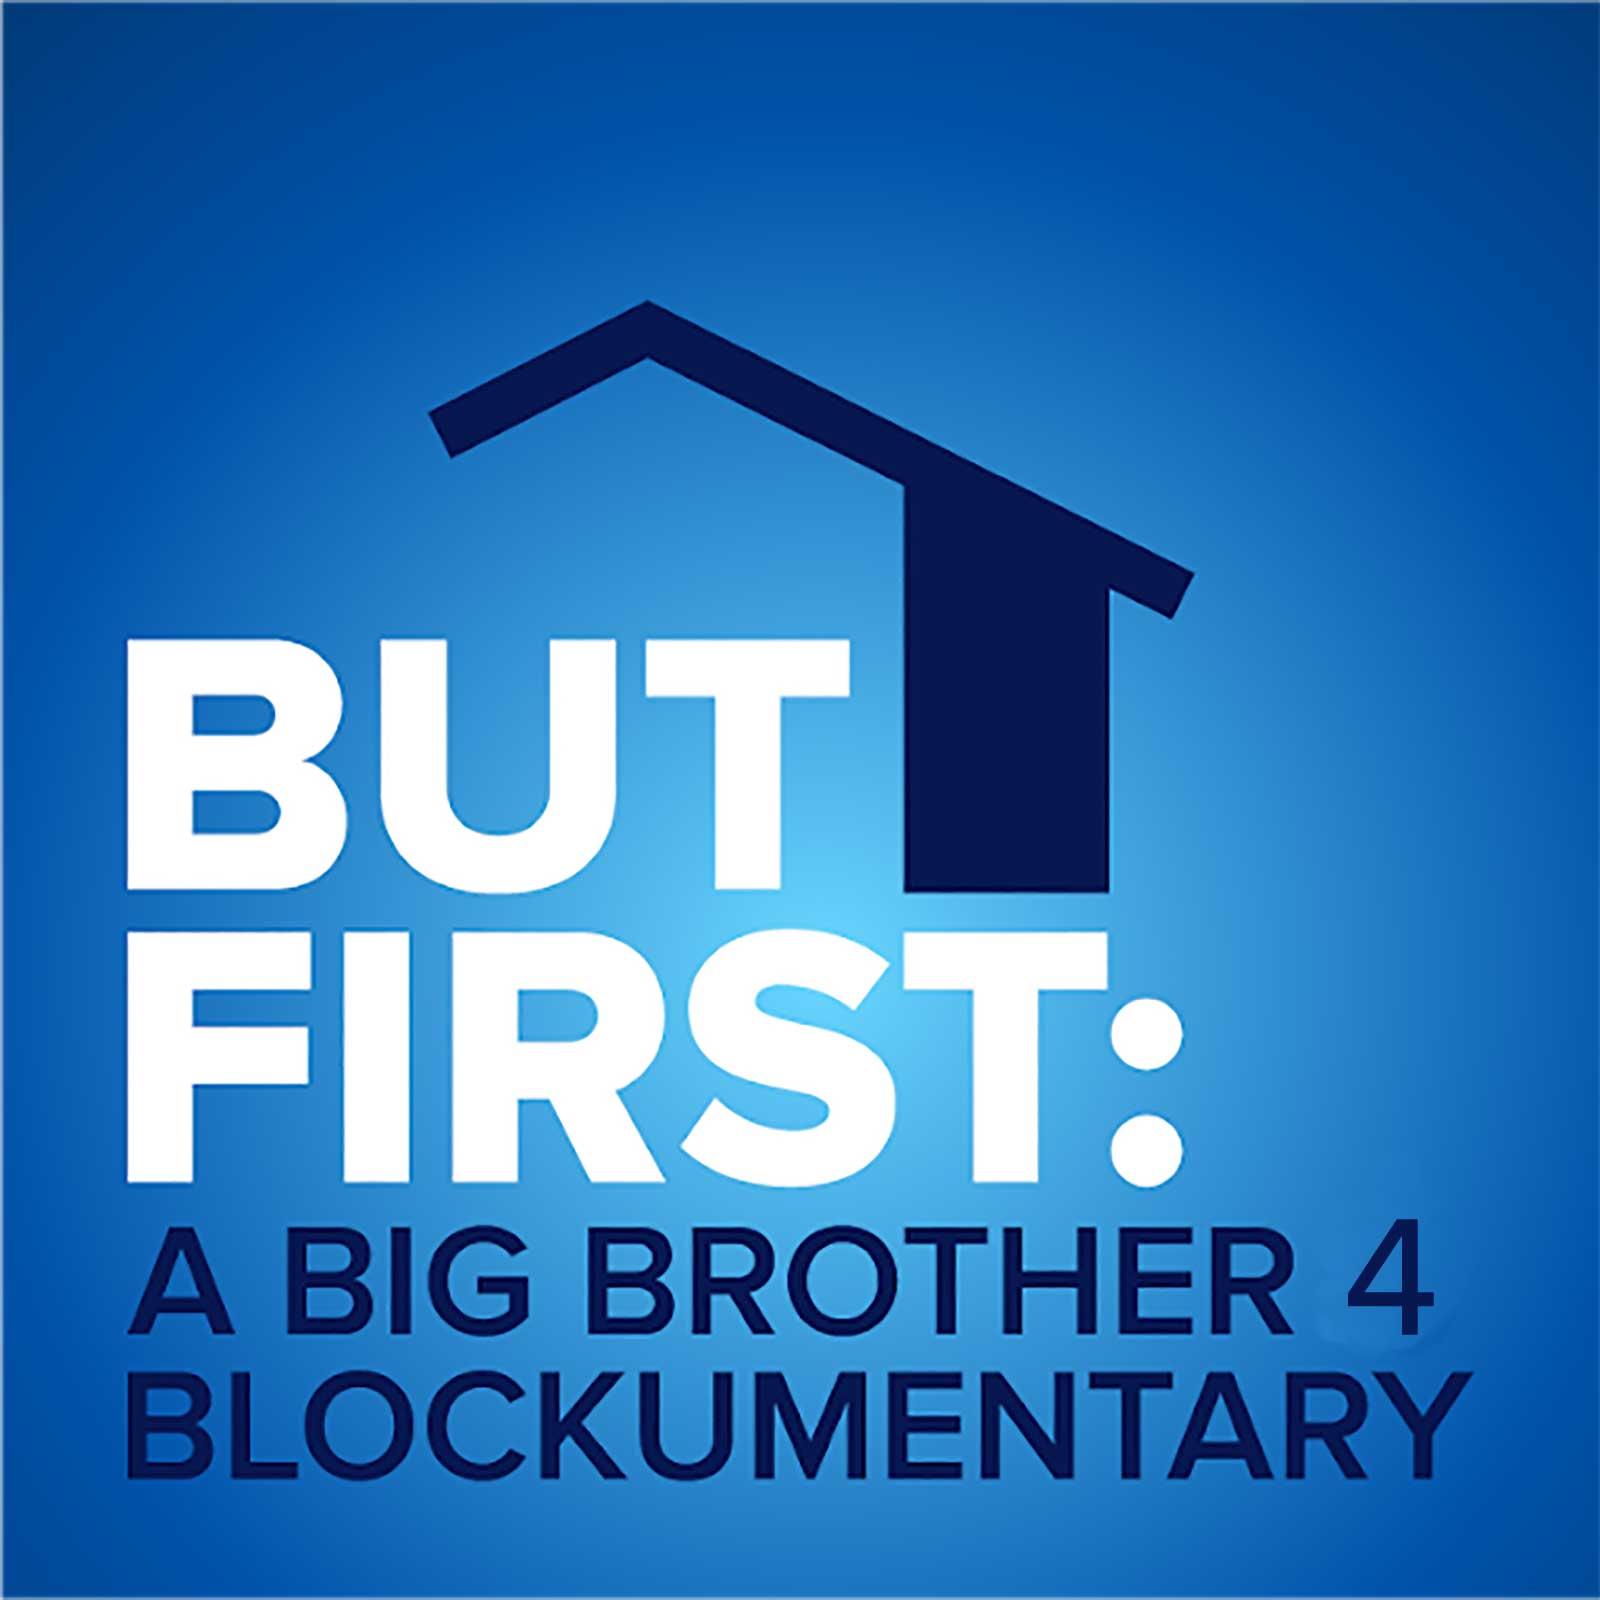 Big Brother 4 Blockumentary